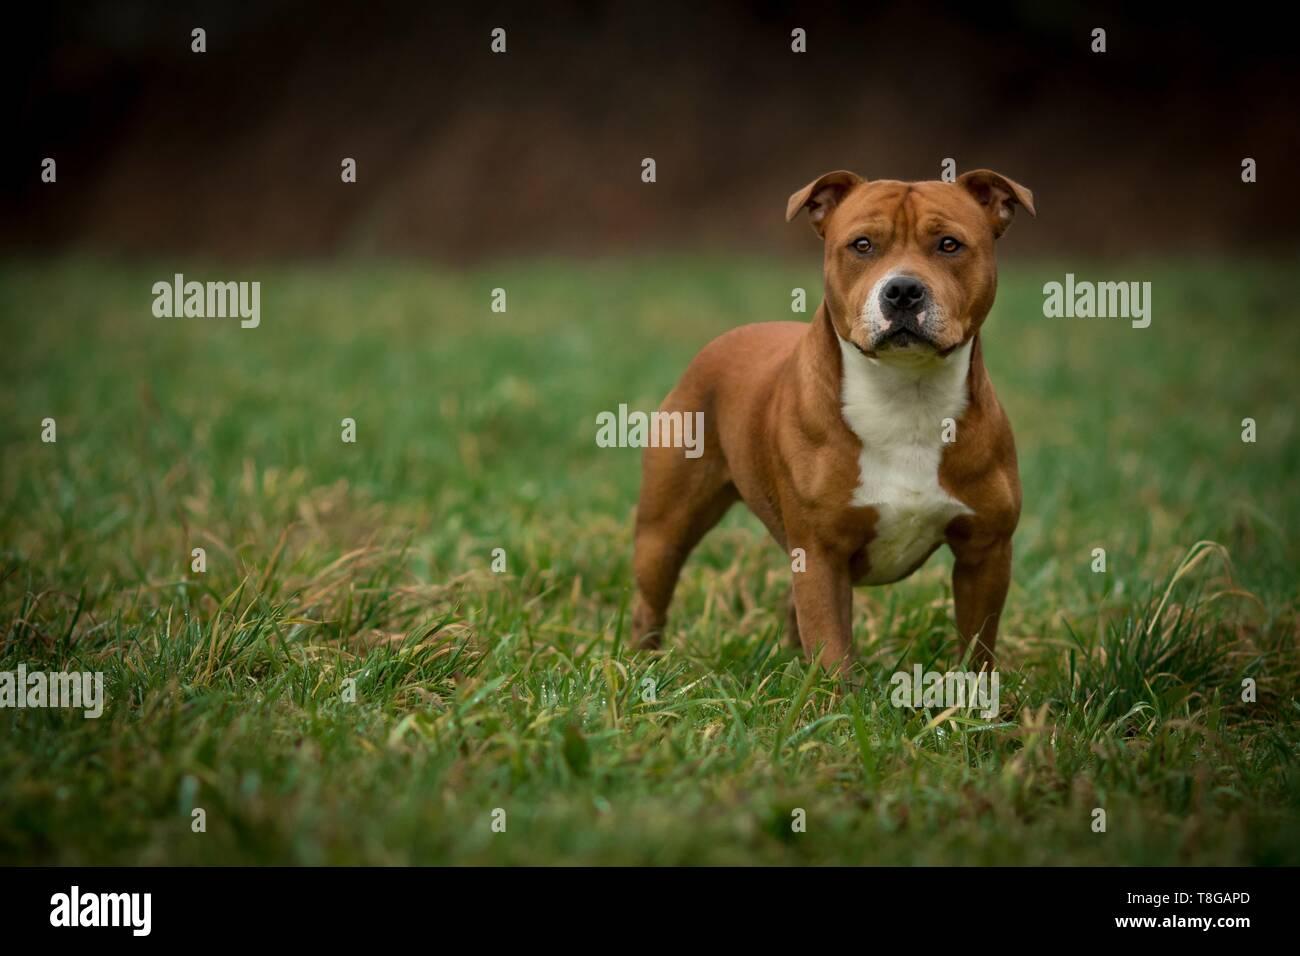 standing Staffordshire Bullterrier - Stock Image